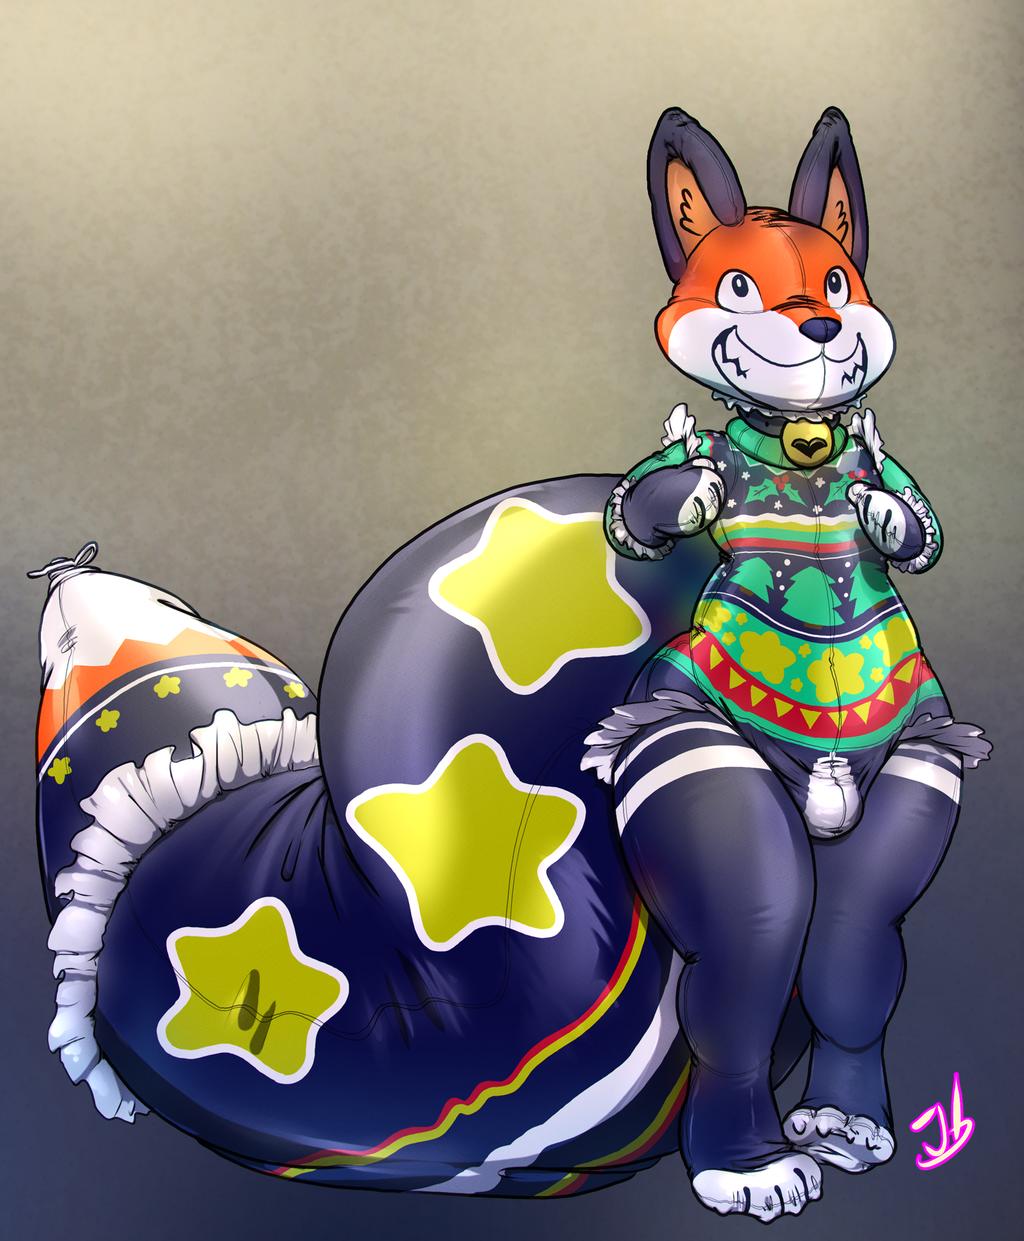 Making a Festive Fox 2